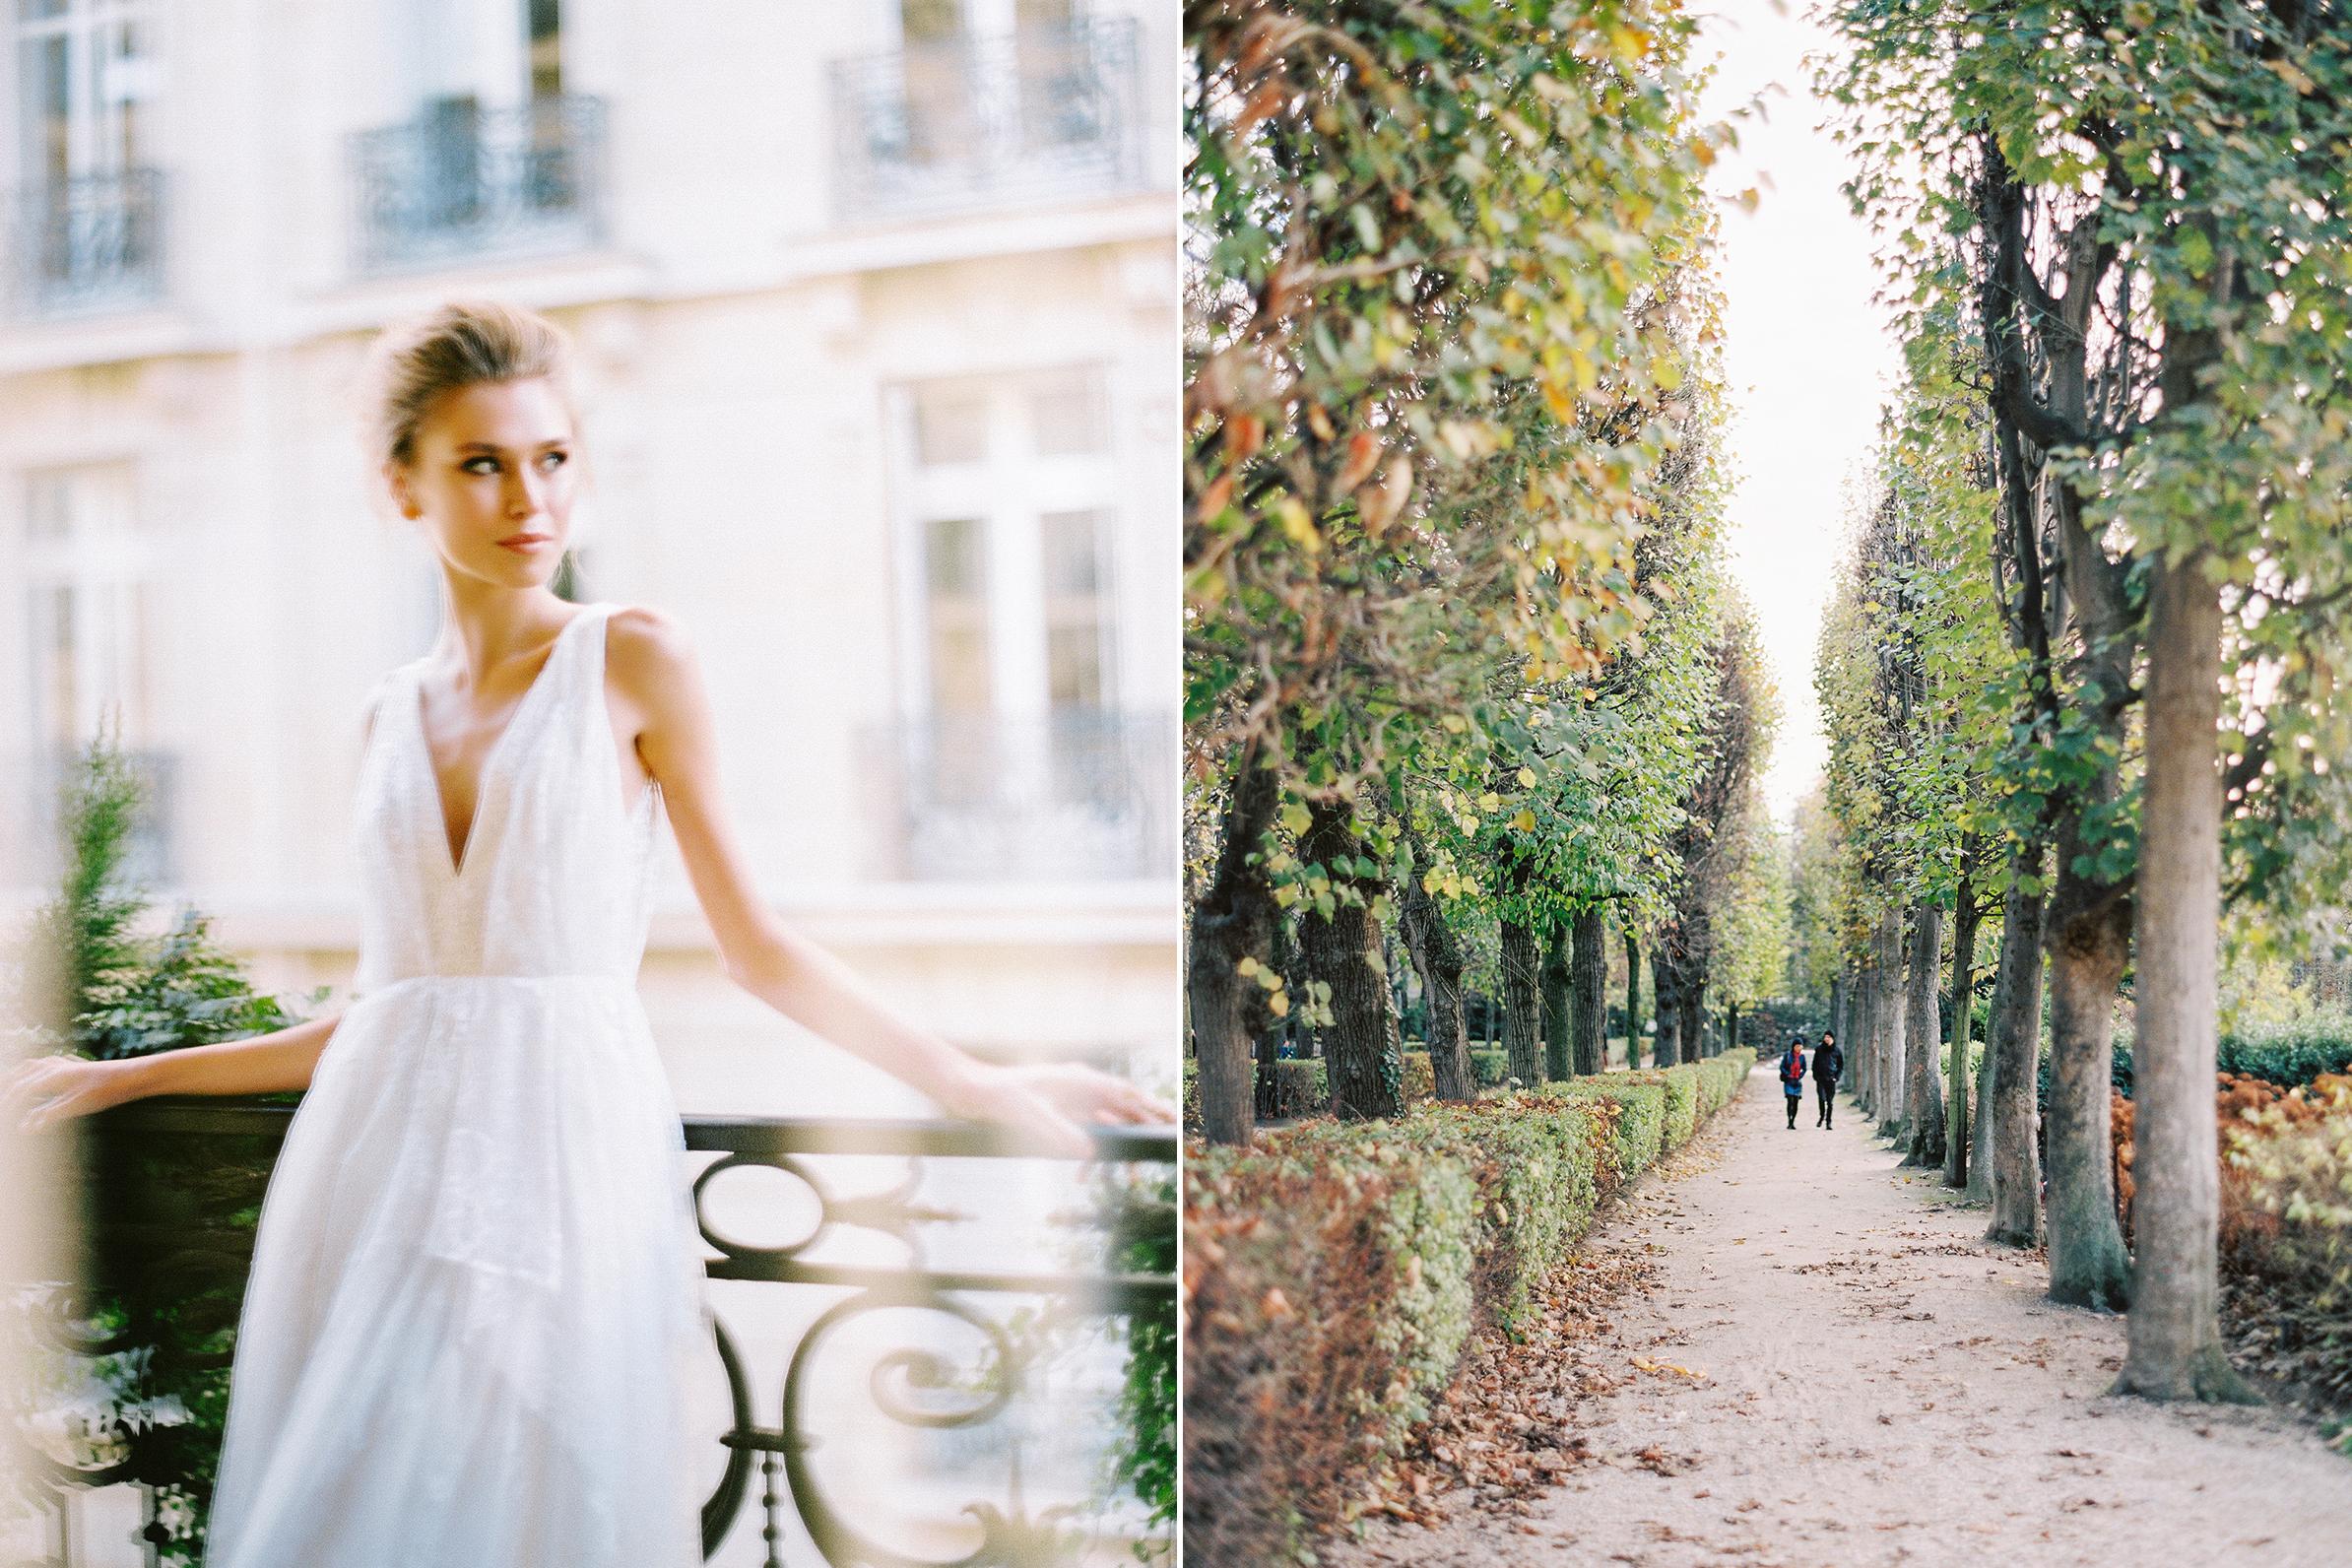 katie stoops photography-paris wedding-marchesa-cynthia martyn events07.jpg